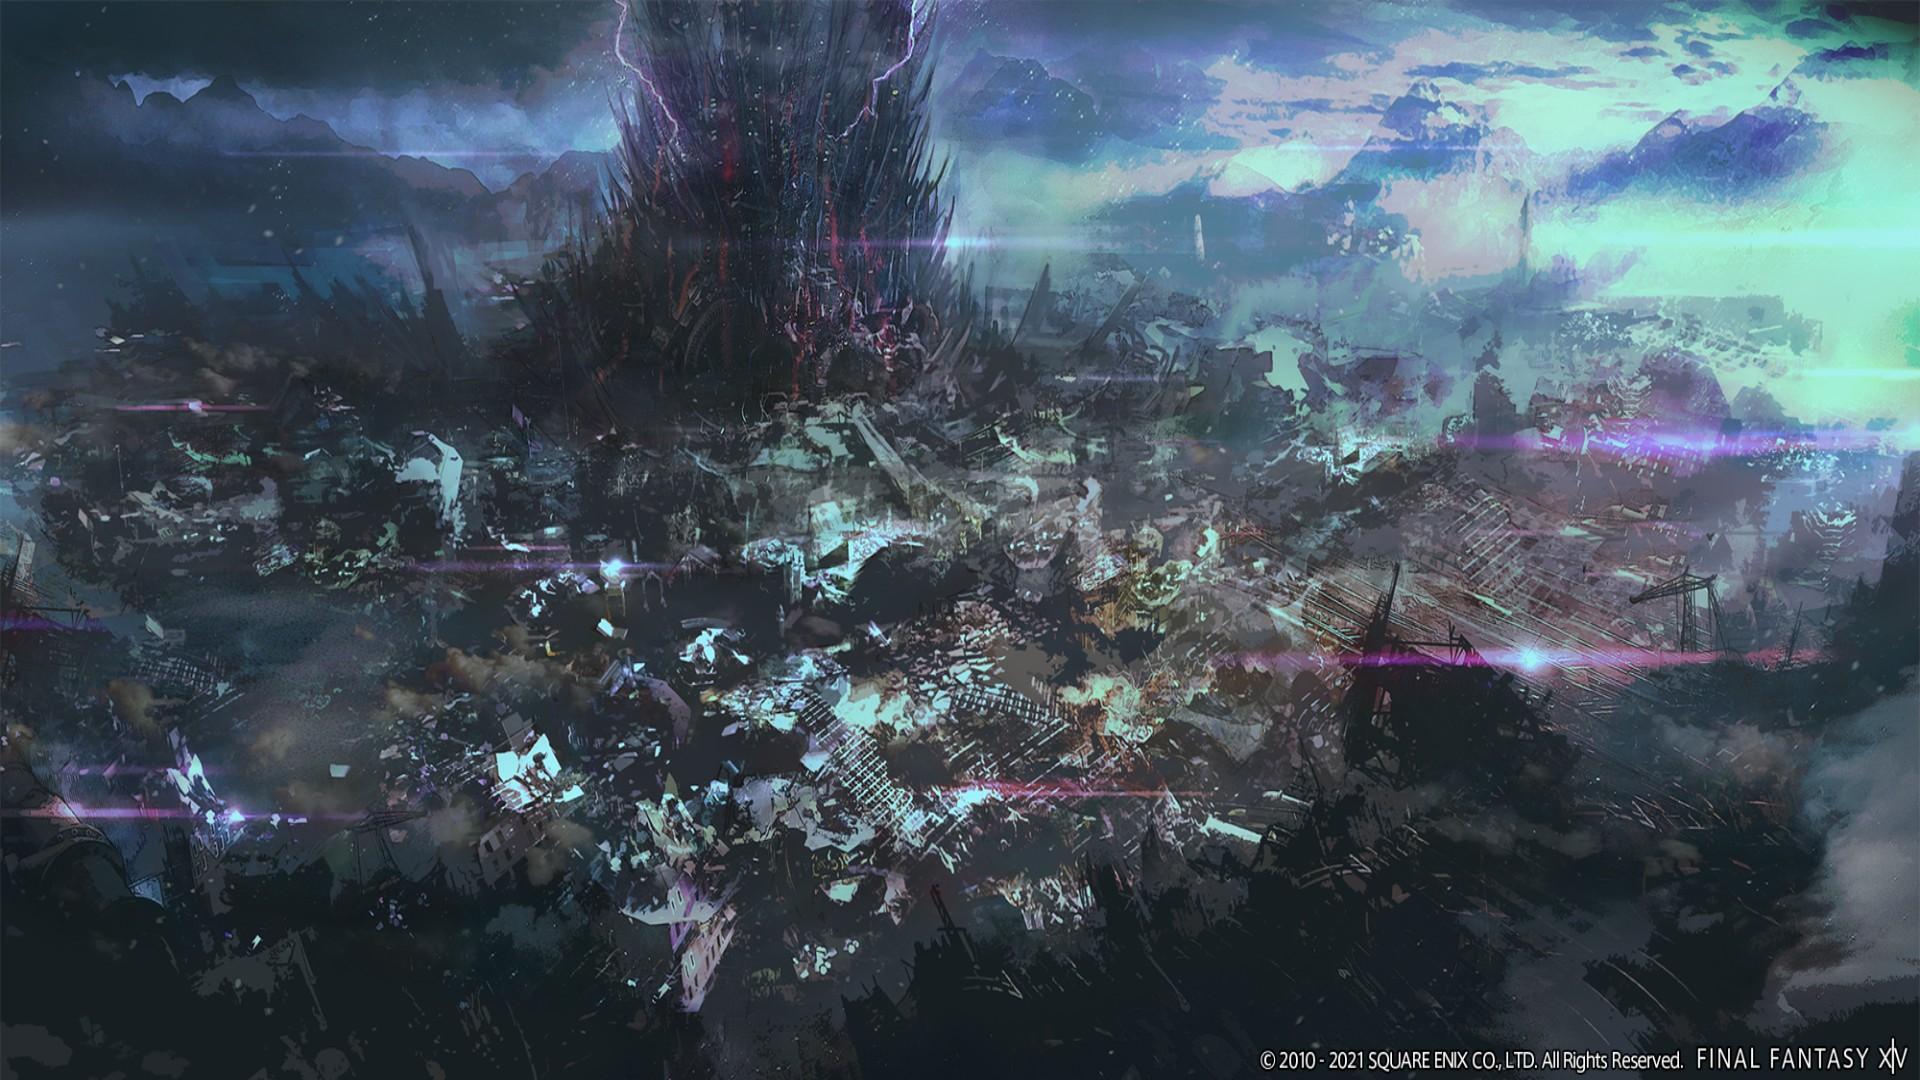 Final Fantasy 14 Garlemald